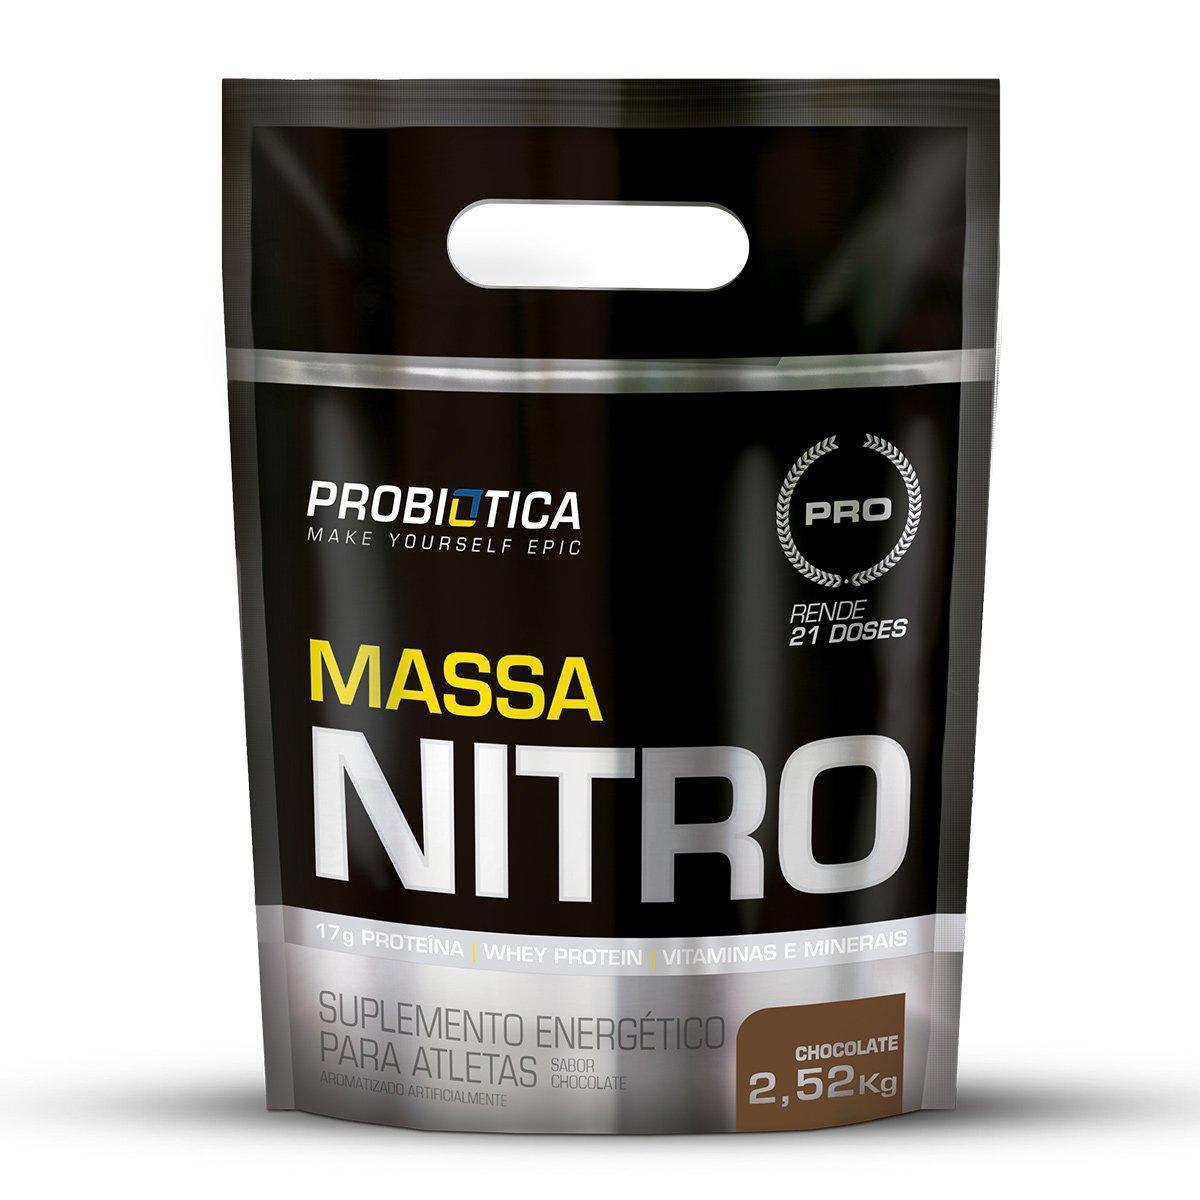 MASSA NITRO CHOCOLATE 2,52KG REFIL - PROBIÓTICA